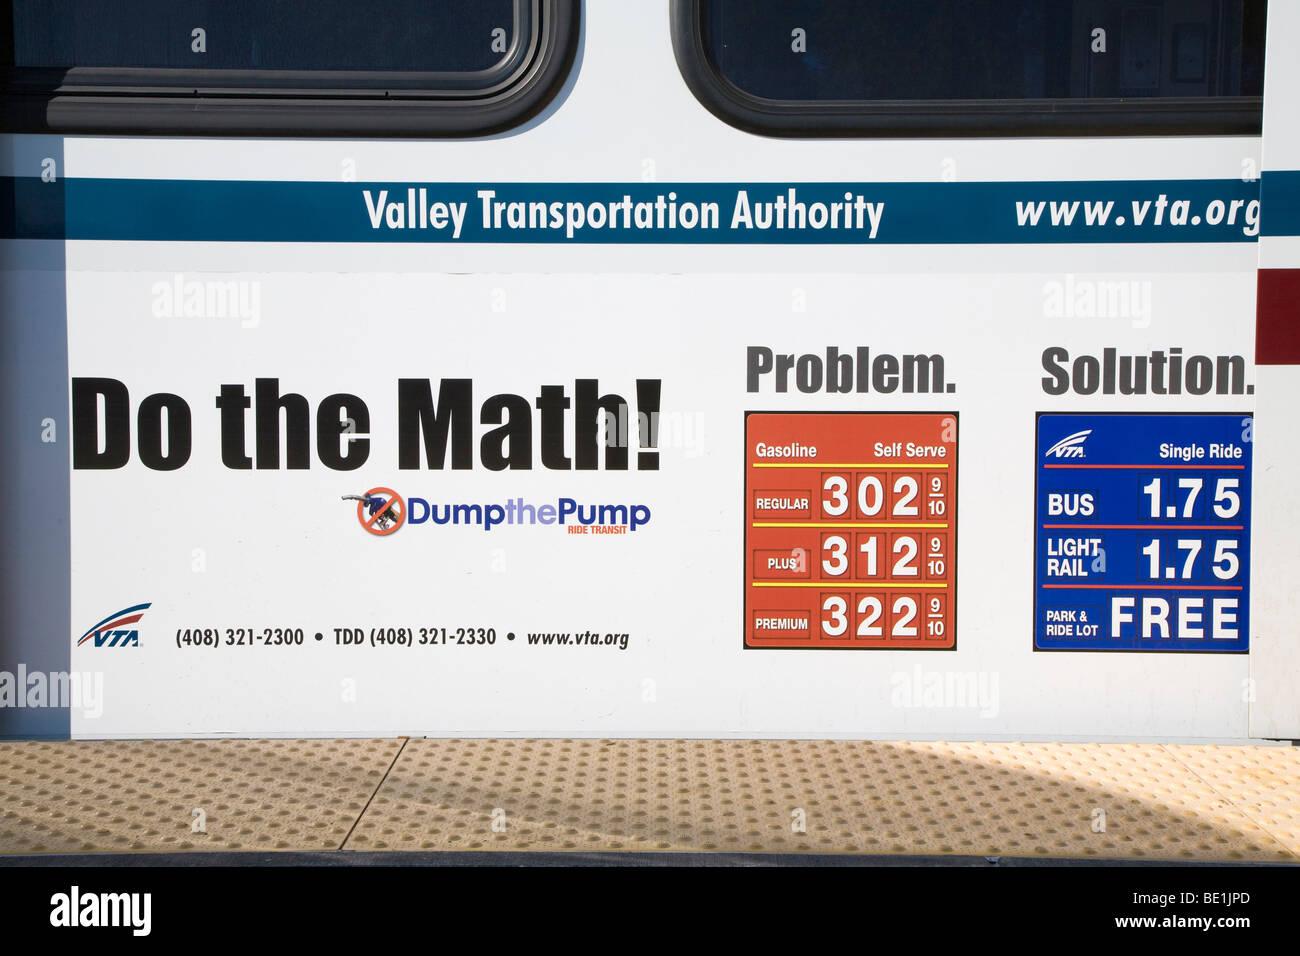 Mass transit promotional advertising on a side of a VTA light rail